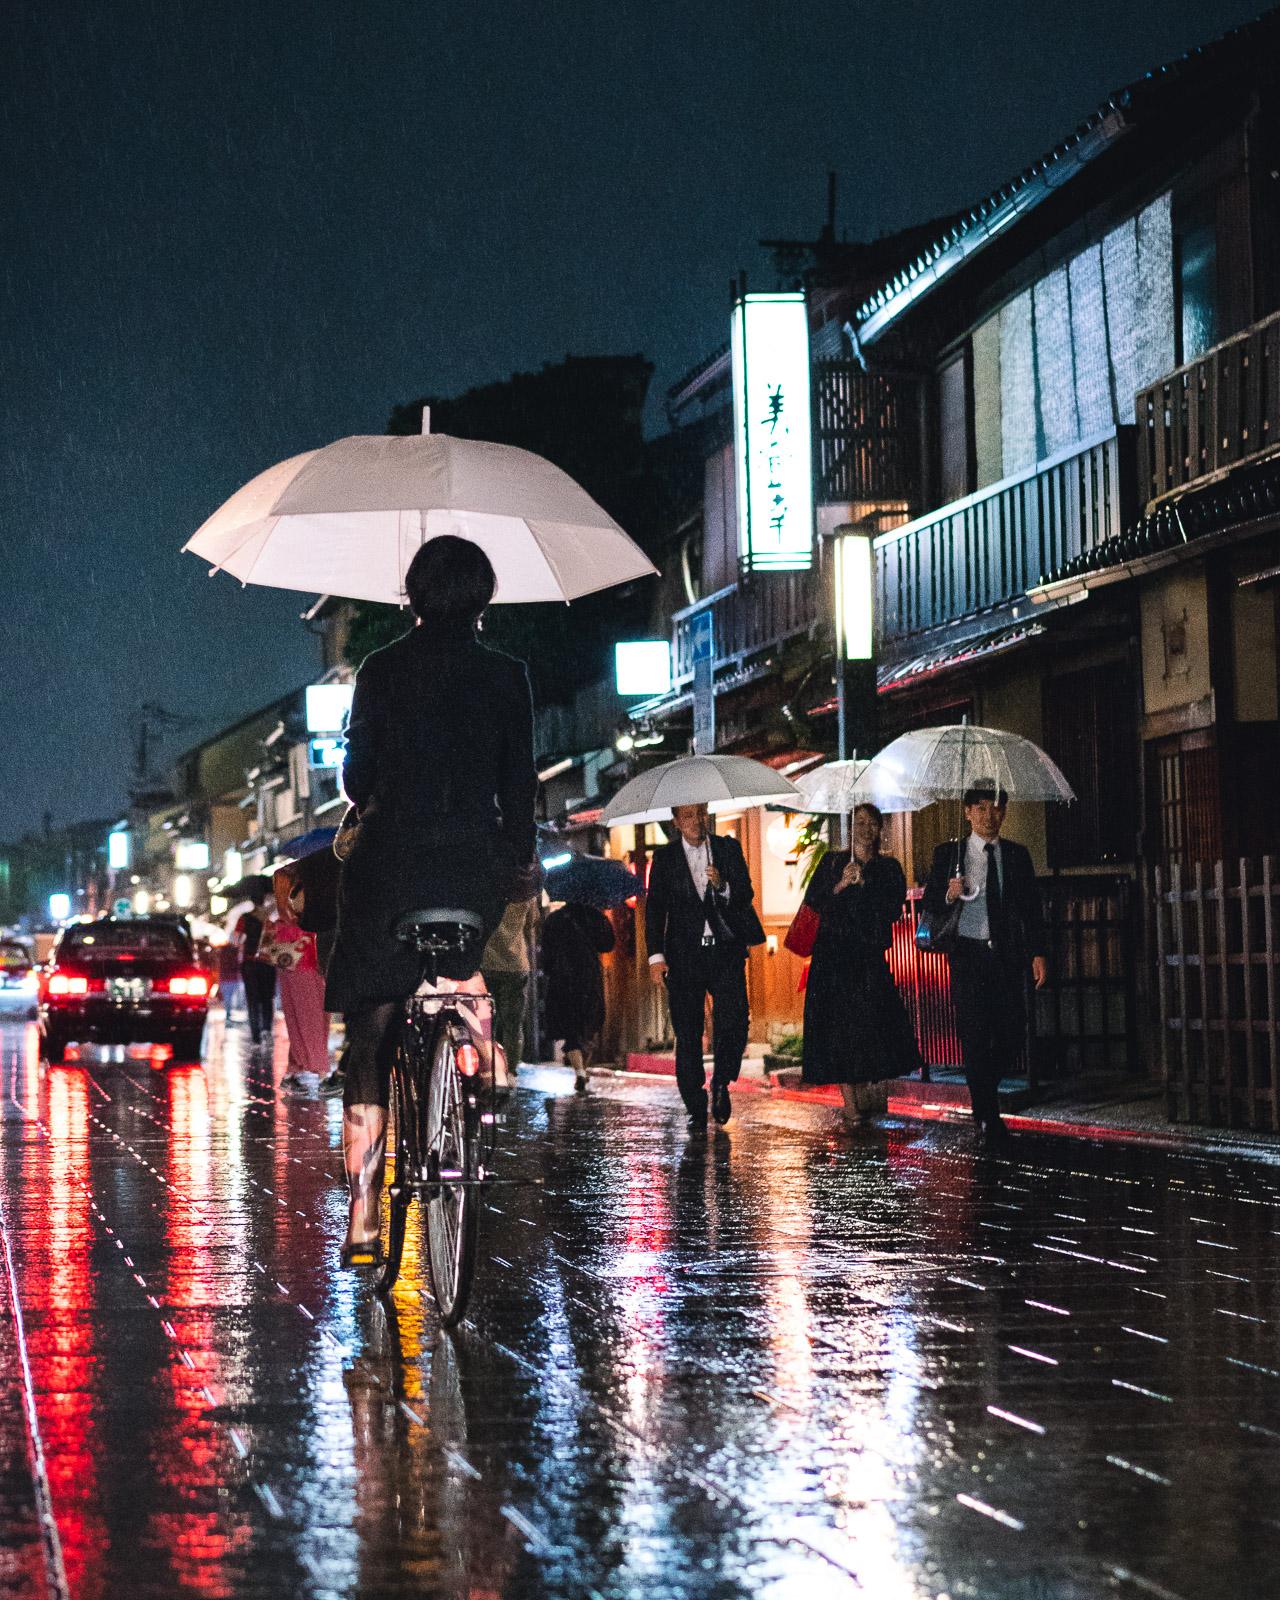 Japan-Street-Photography-People-14.jpg